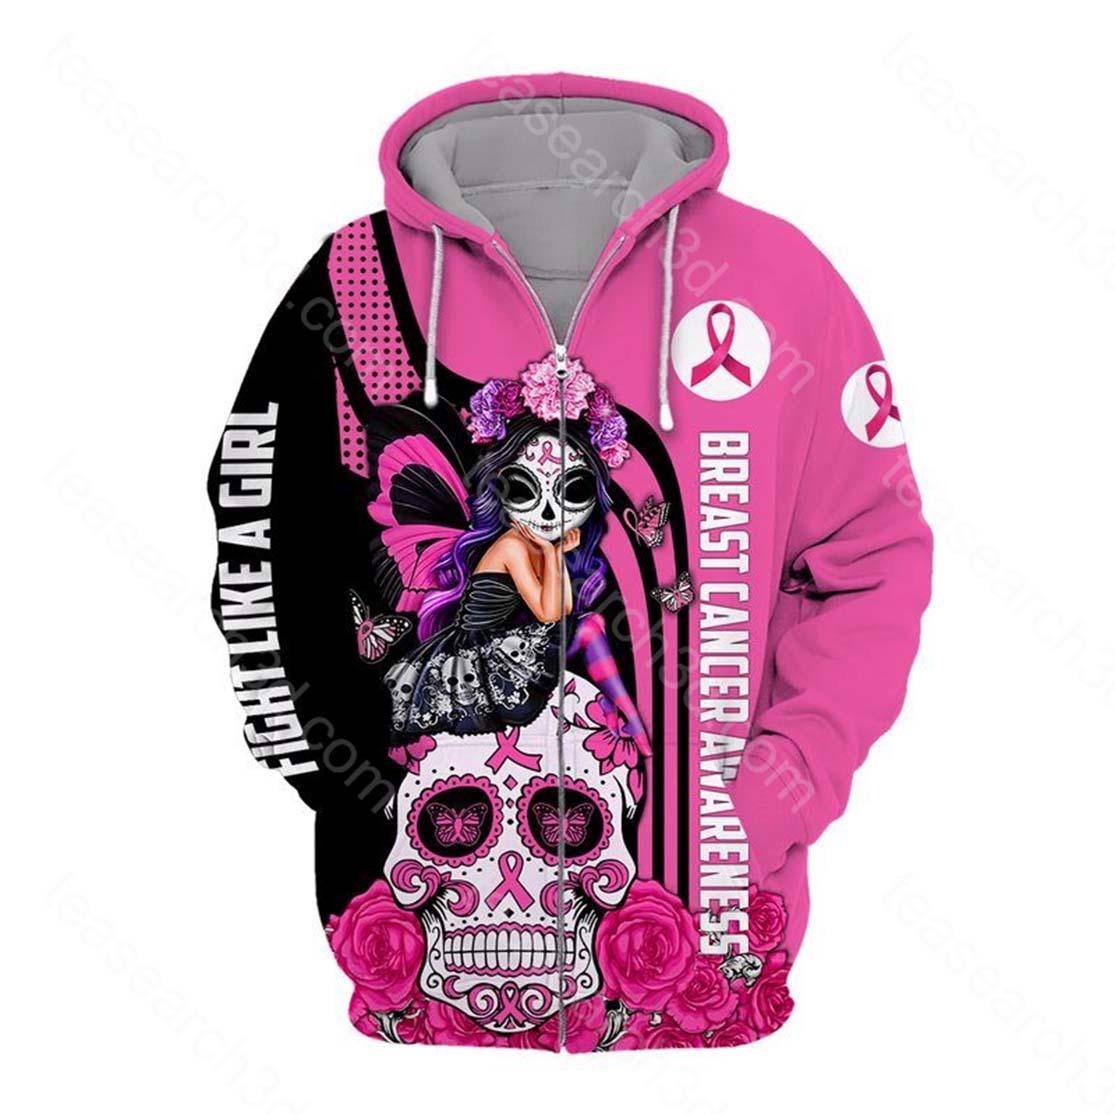 Sugar skull fairy Fight like a girl Breast cancer awareness 3d zip hoodie